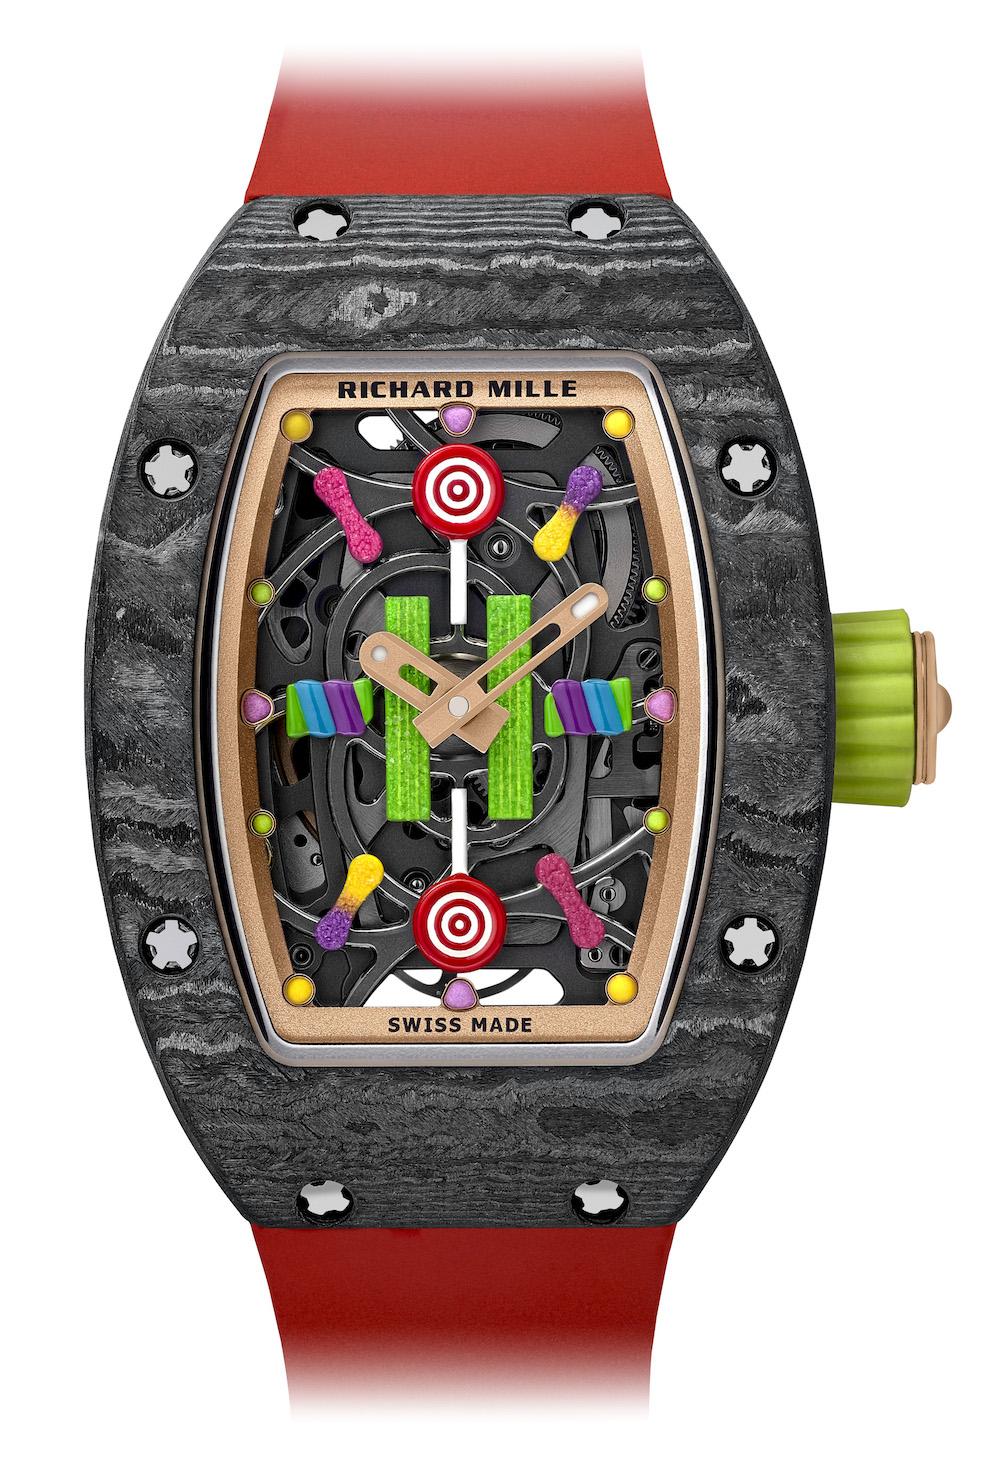 Richard Mille Bon Bon, RM 37-01 Kiwi, RM 37-01 Cerise, Richard Mille candy